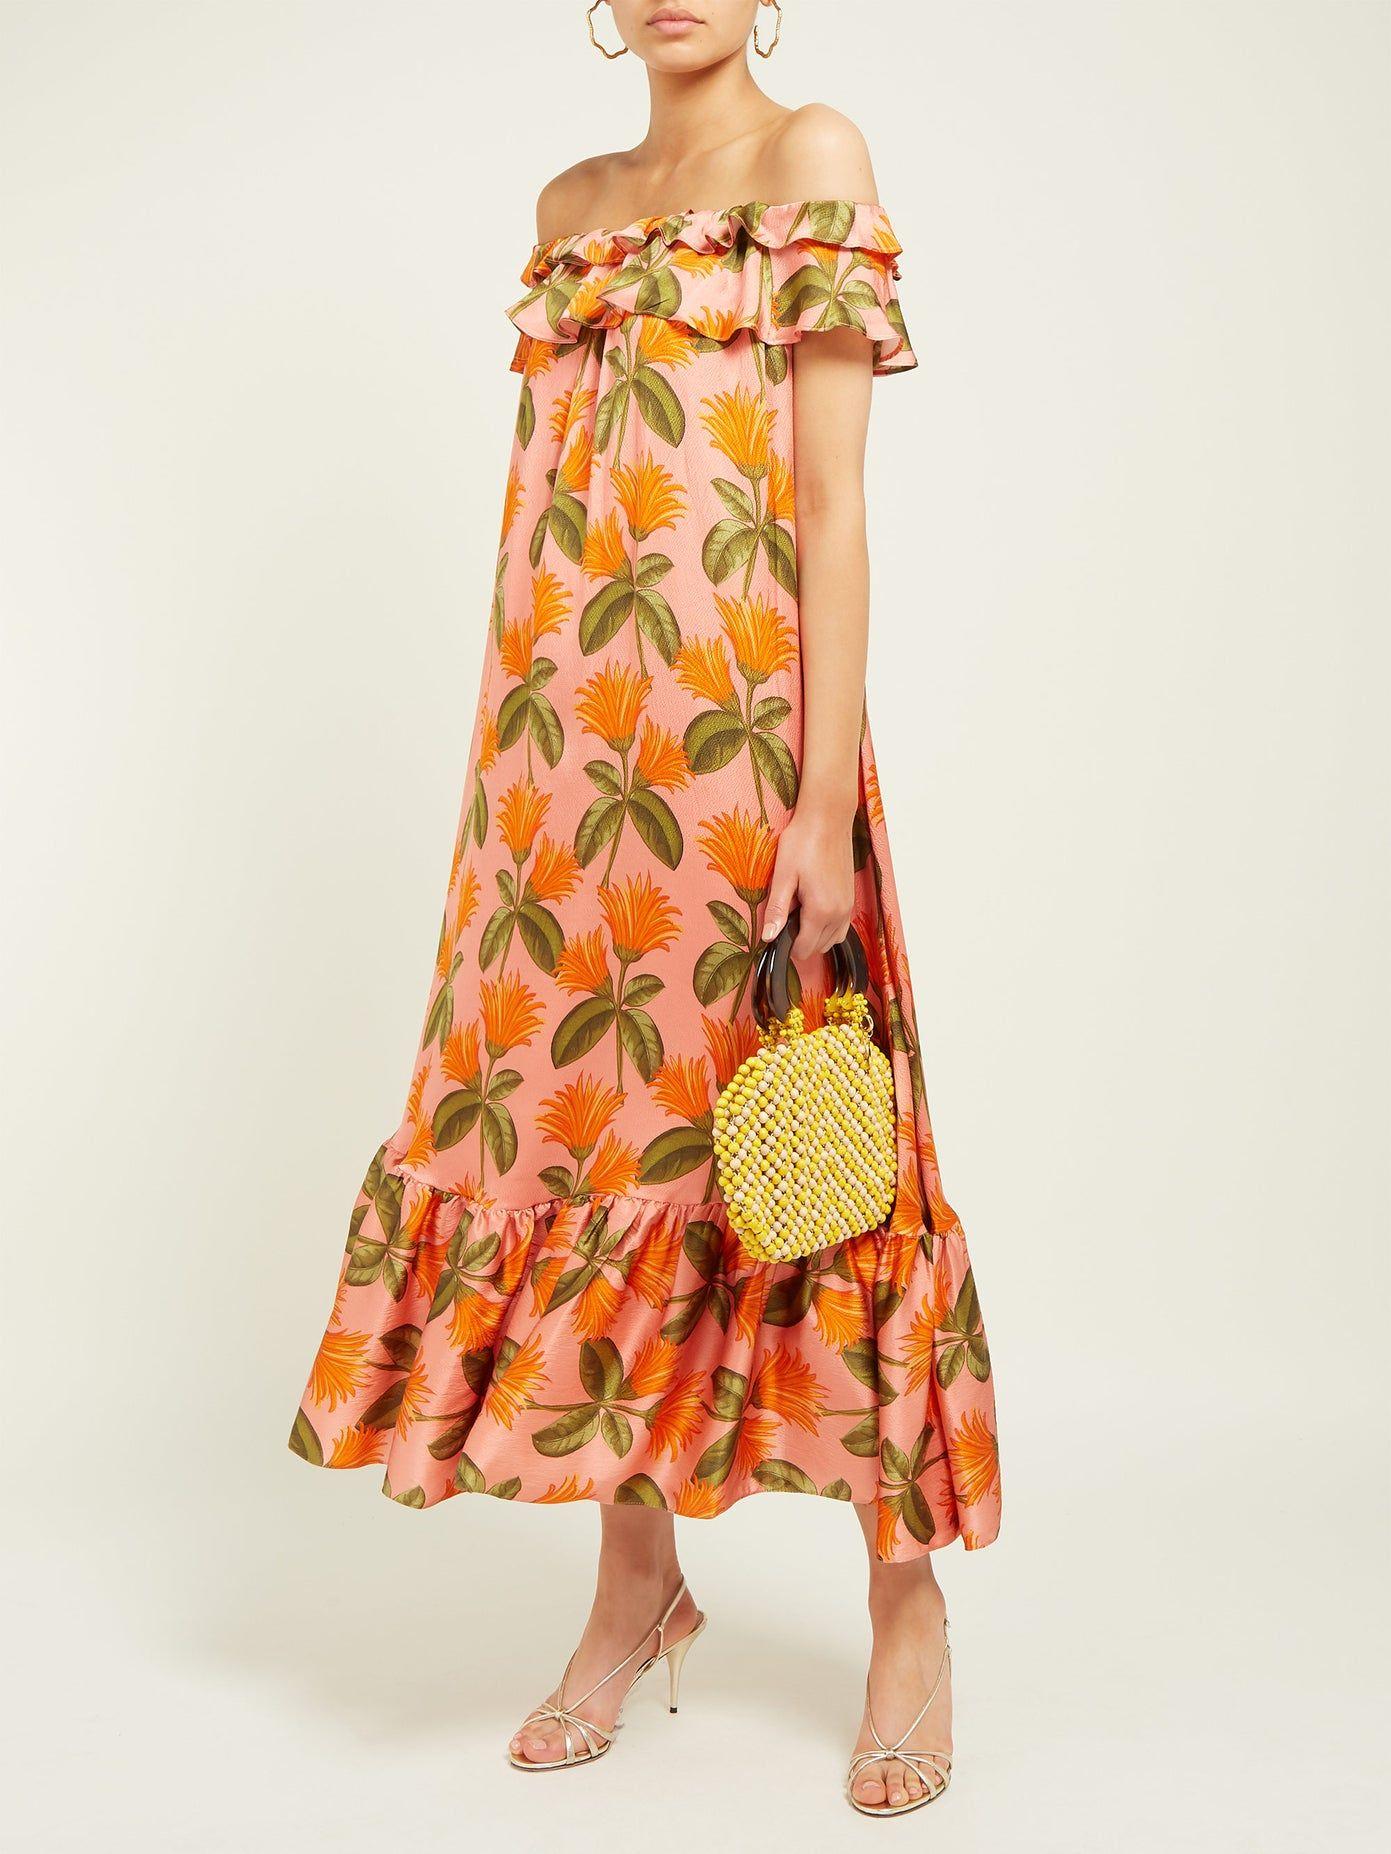 Agata Floral Print Silk Satin Midi Dress Borgo De Nor Matchesfashion Us In 2020 Satin Midi Dress Dresses Printed Wrap Dresses